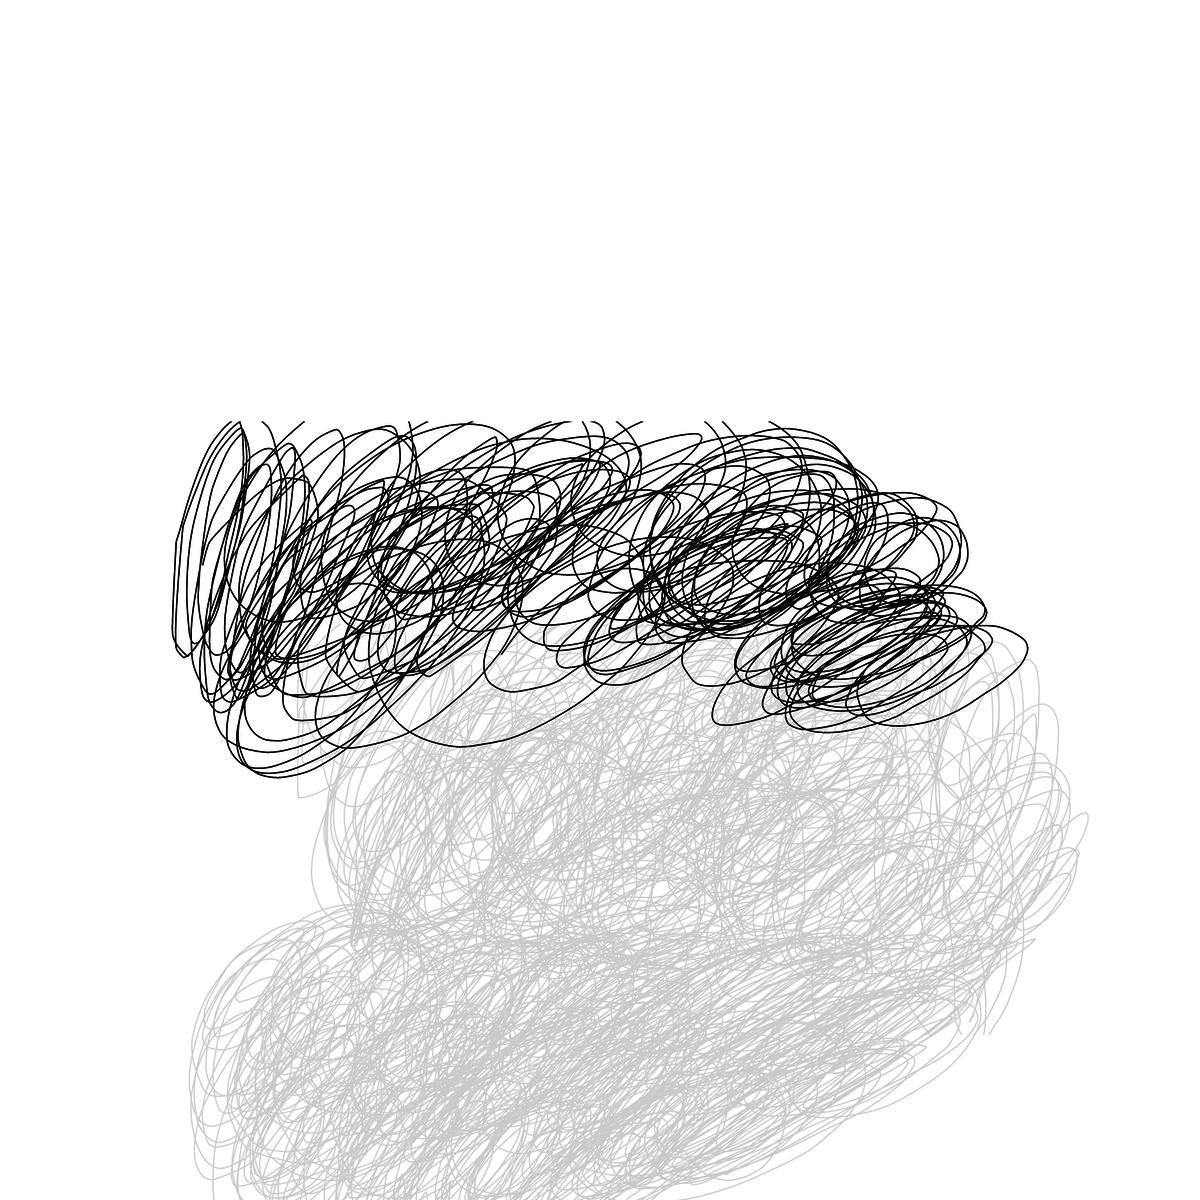 BAAAM drawing#16957 lat:51.2067222595214840lng: 3.2593069076538086